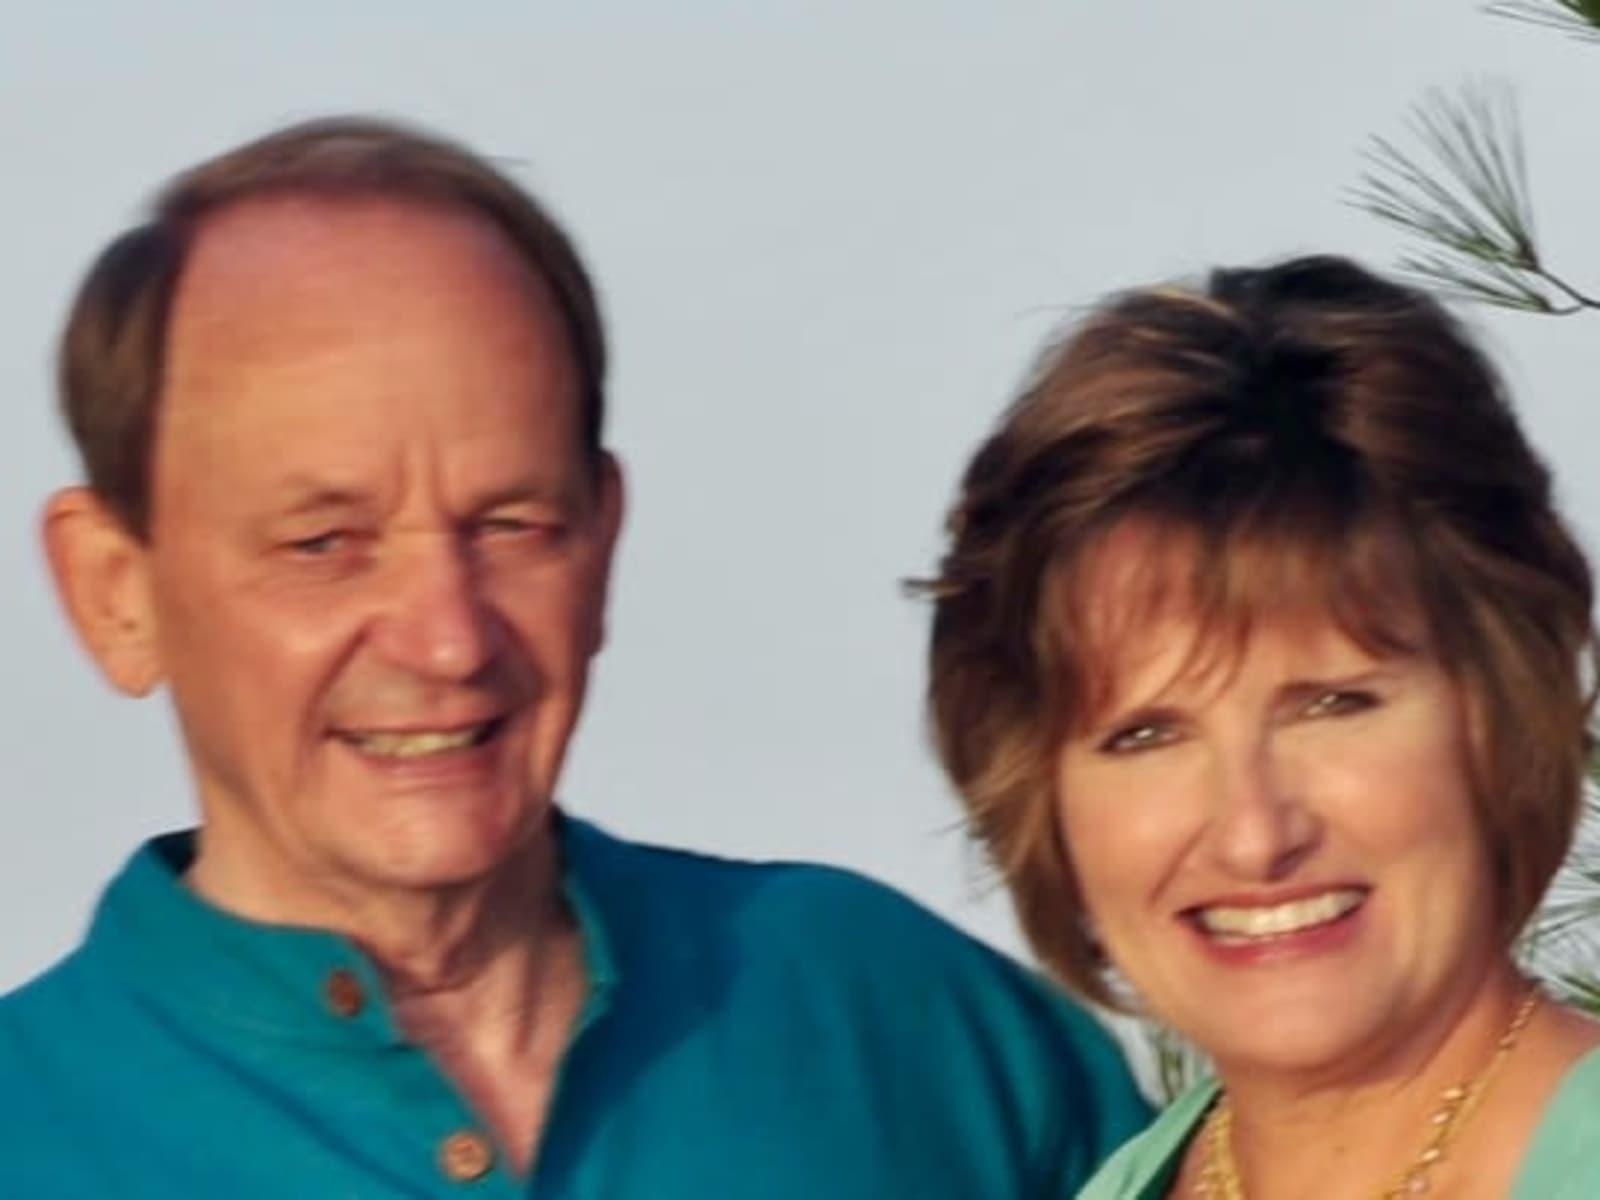 Maryann & David from London, Ontario, Canada